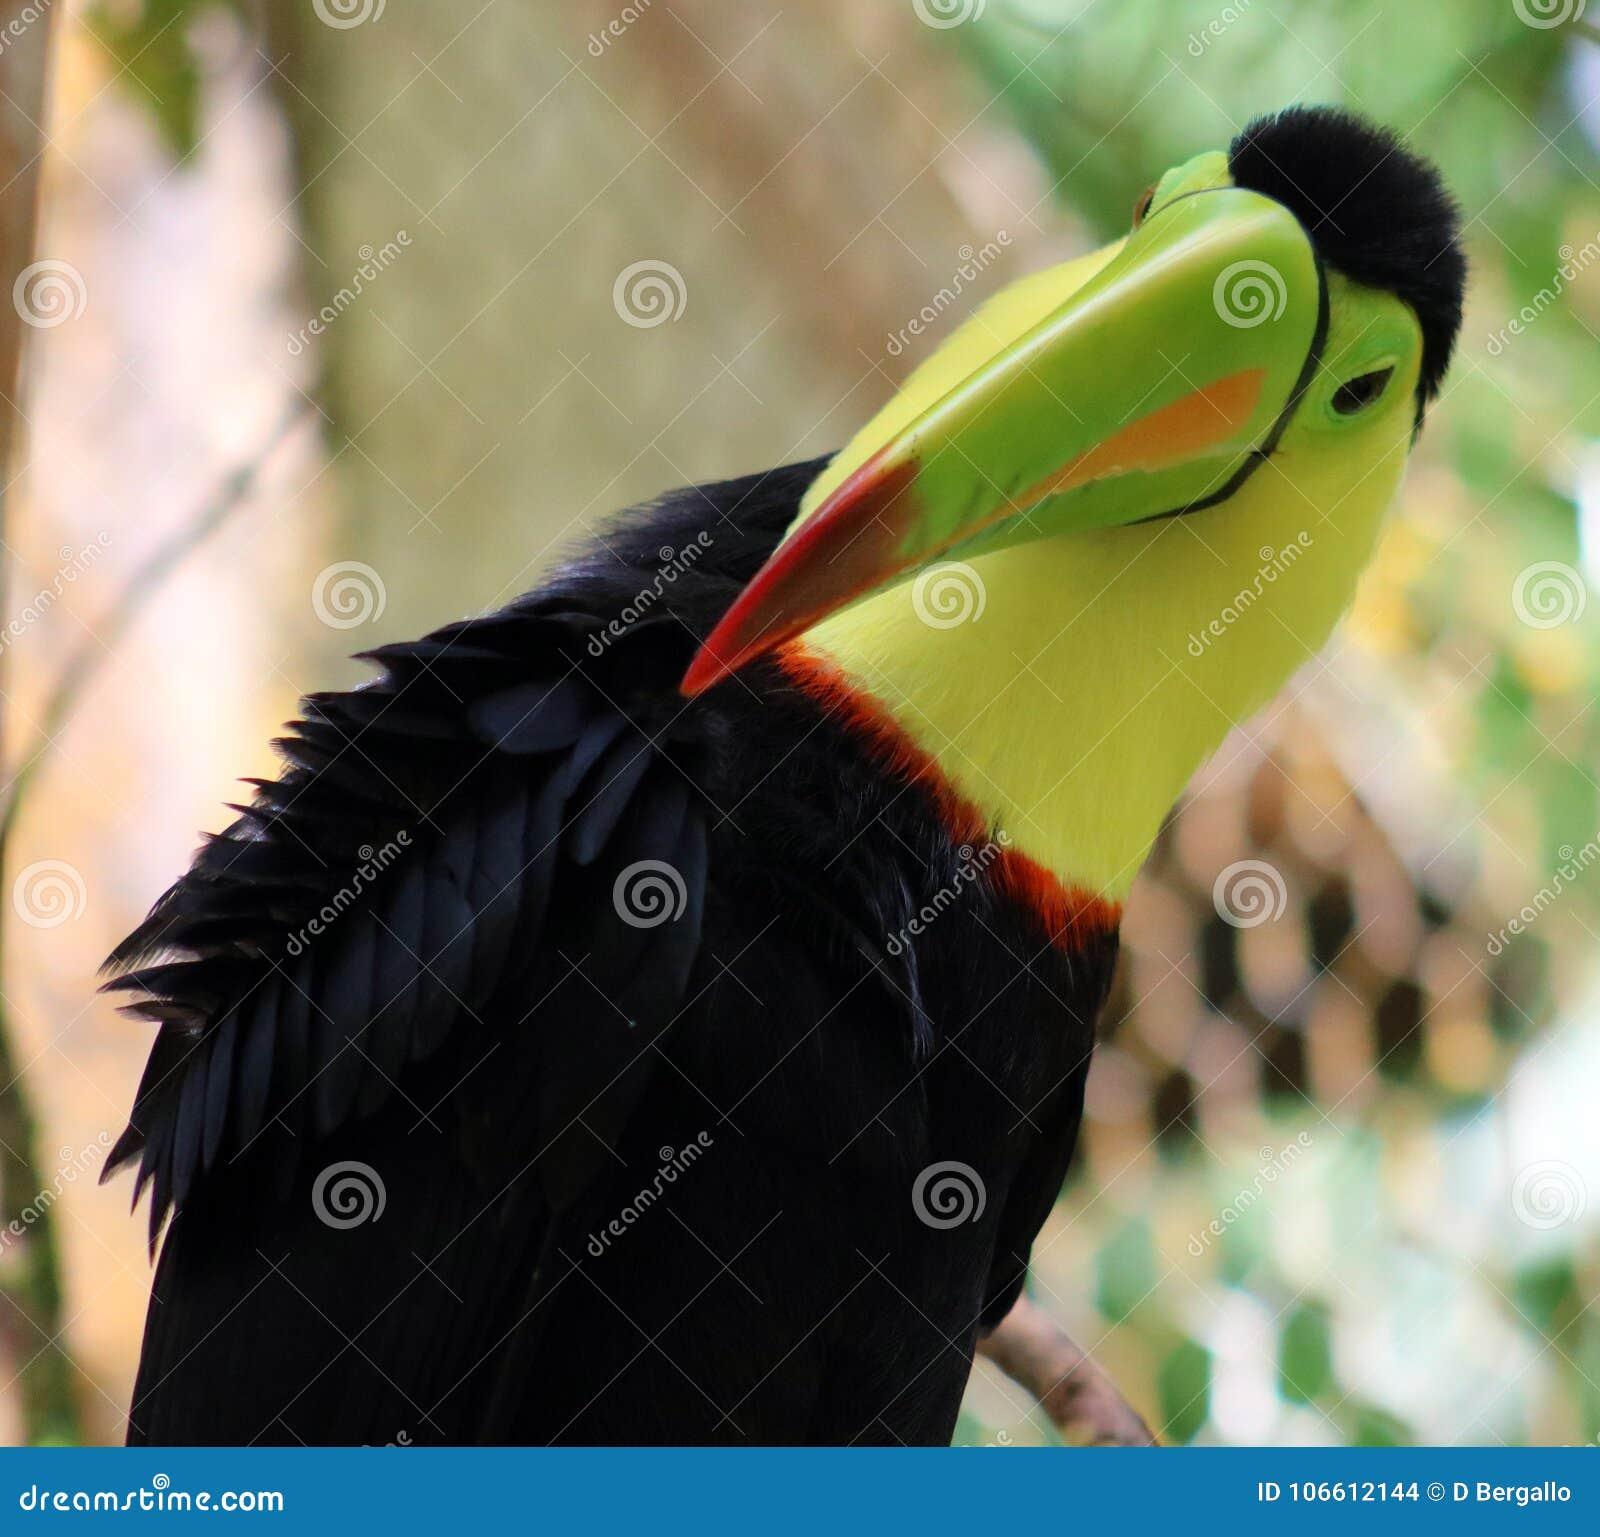 Keel billed colorful beautiful toucan in Costa Rica gorgeous tucan tucano